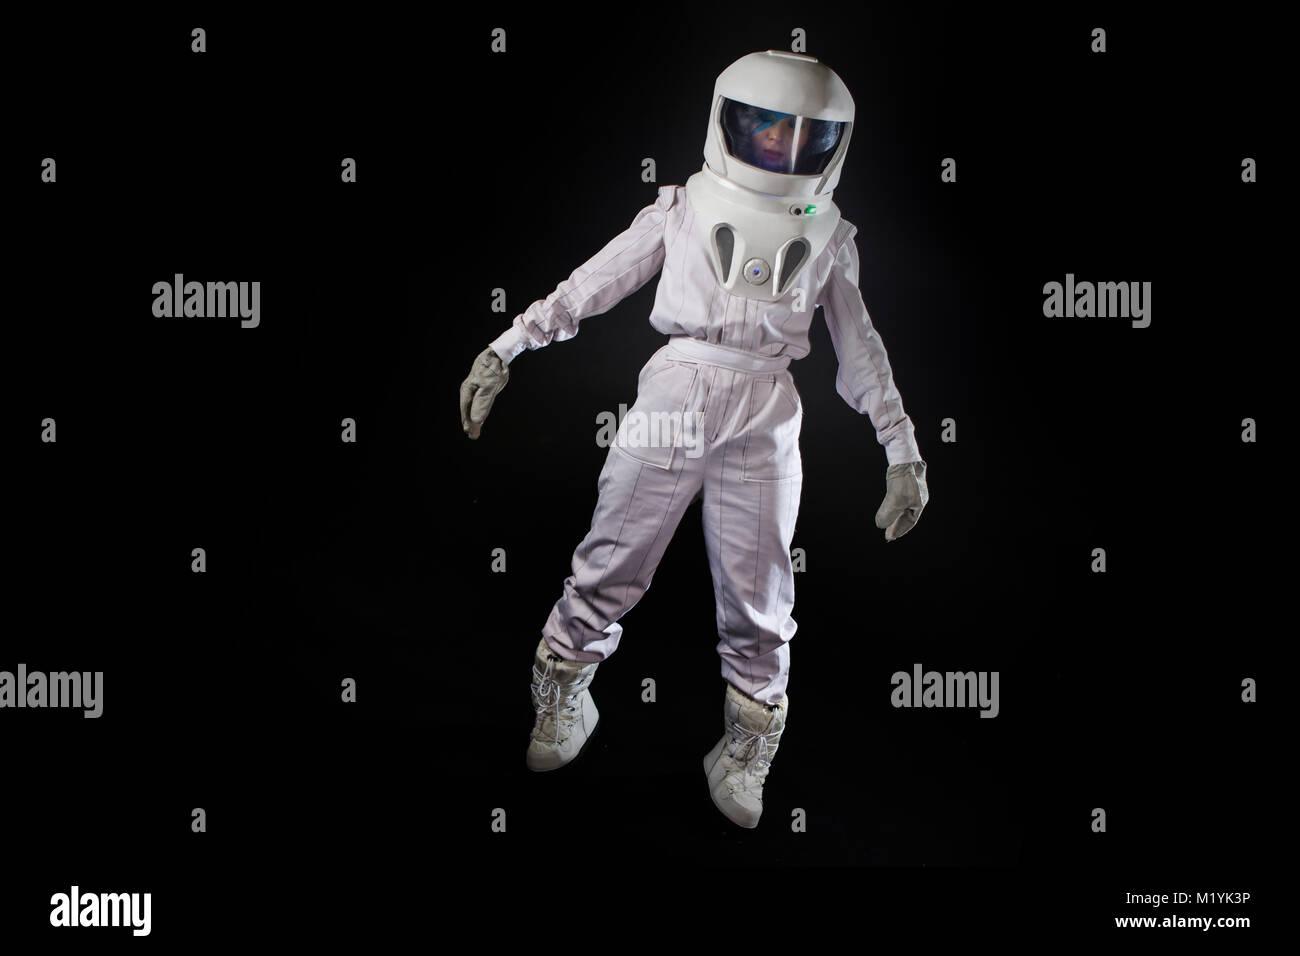 Astronaut in space, in zero gravity on black background Stock Photo